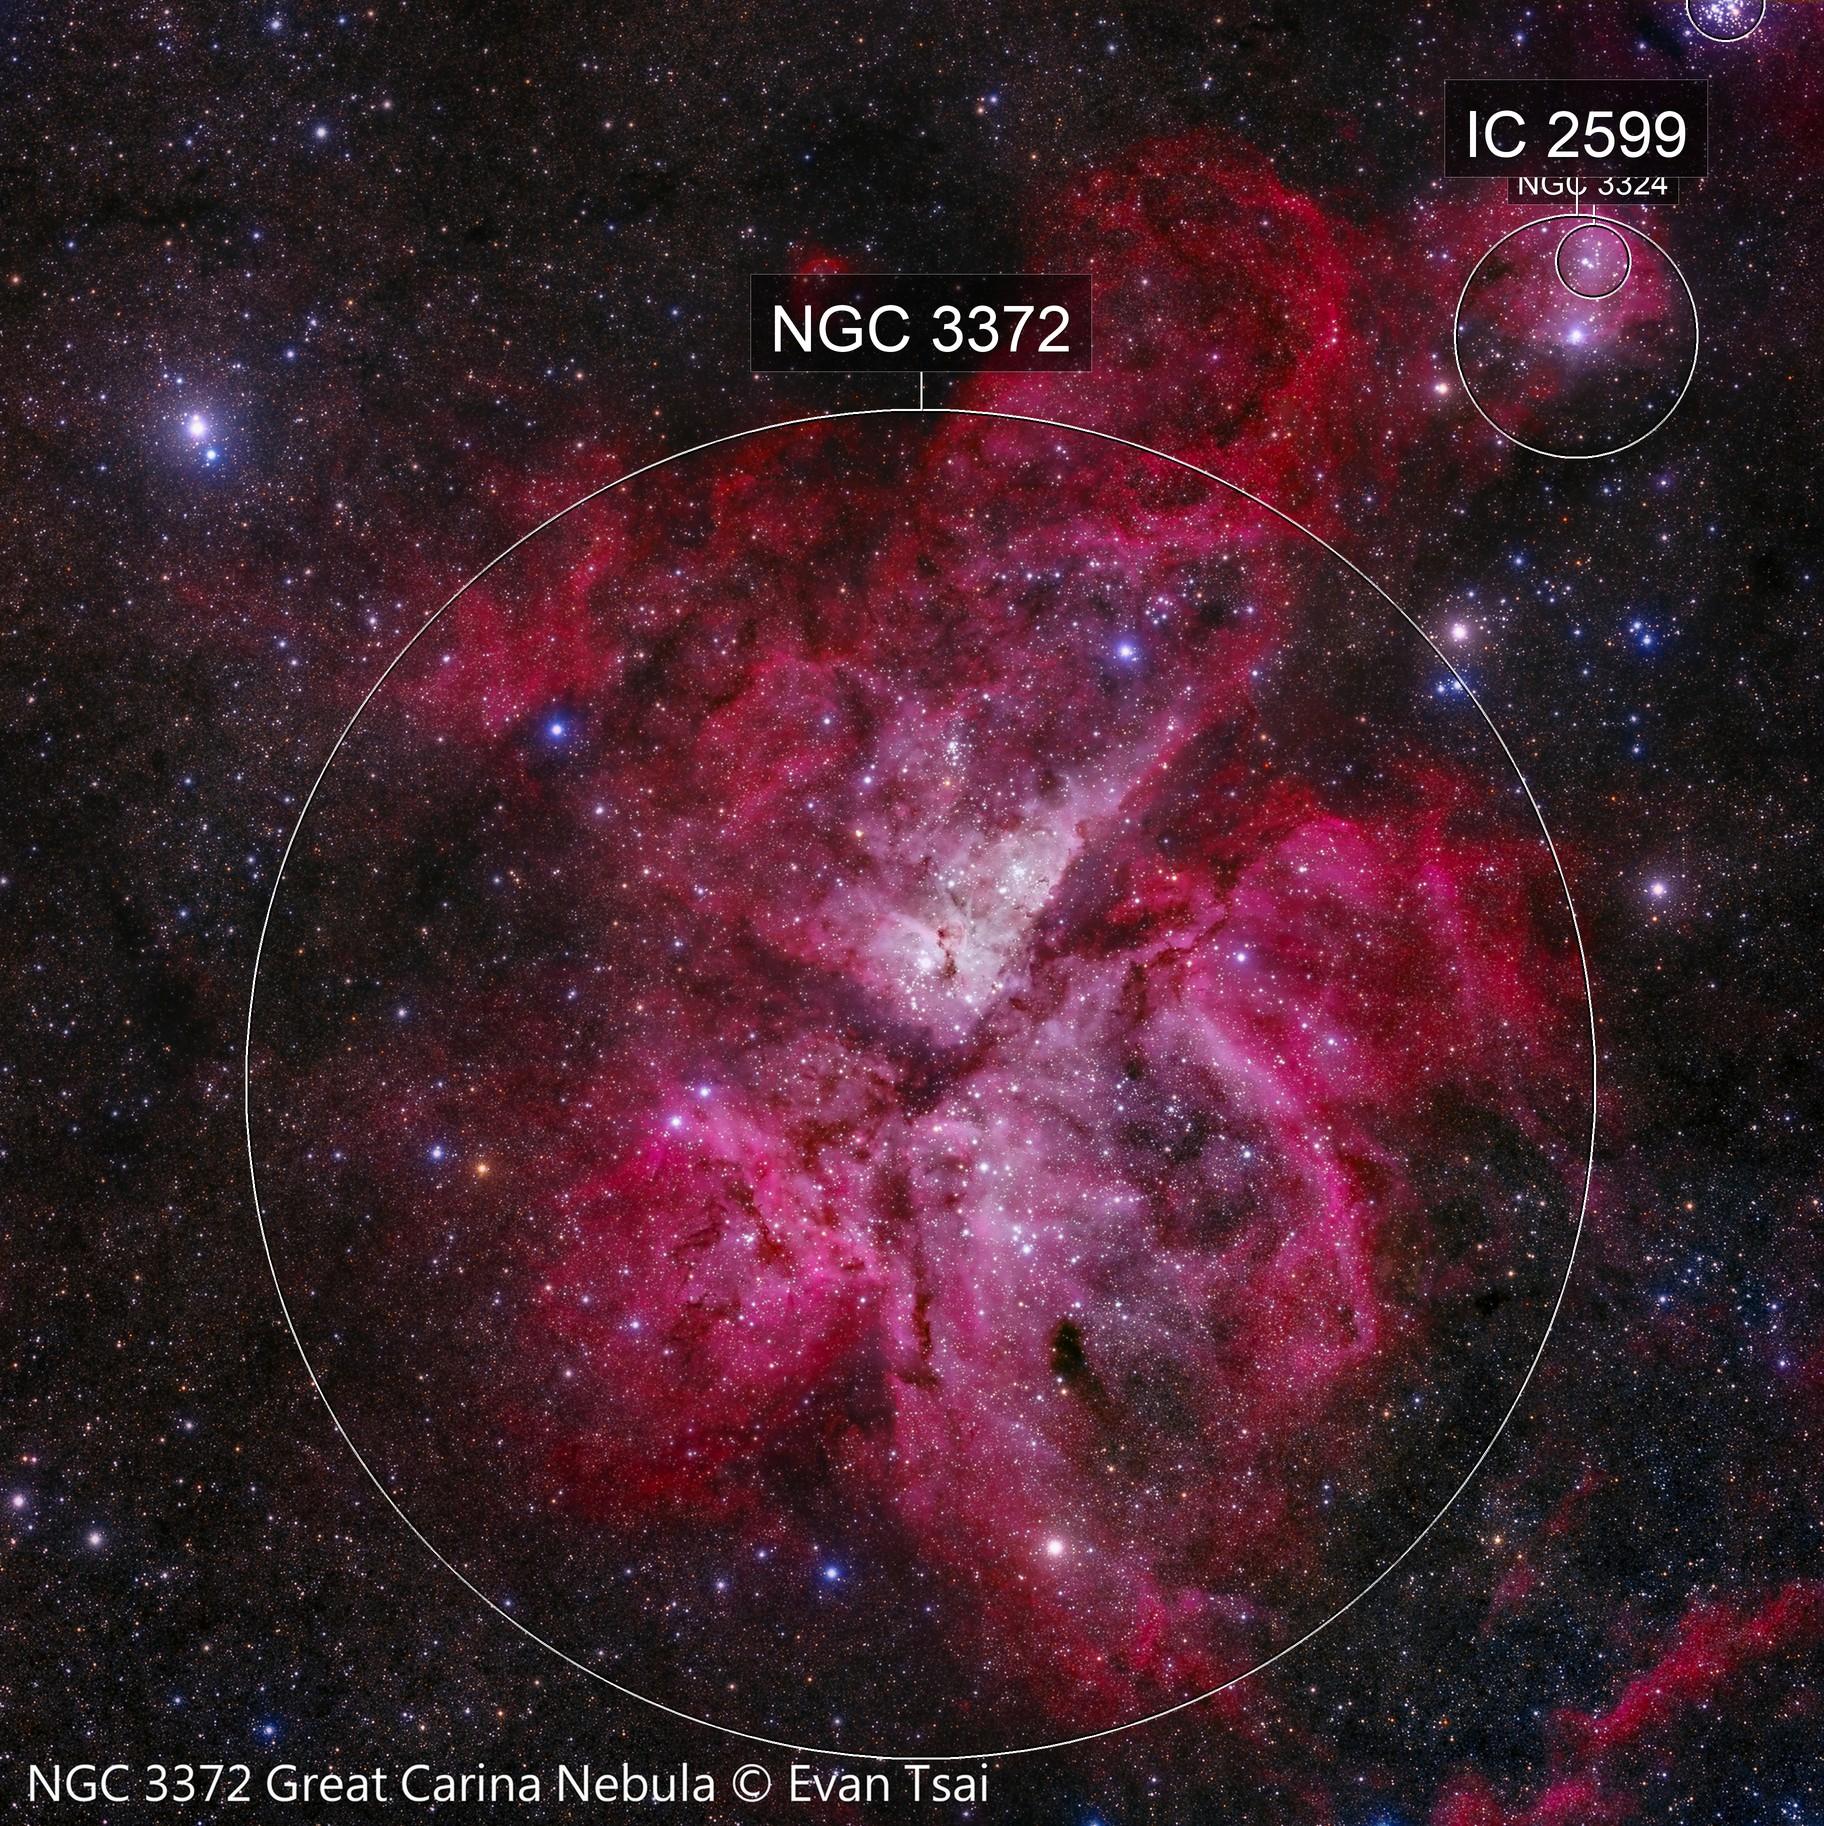 Great Carina Nebula